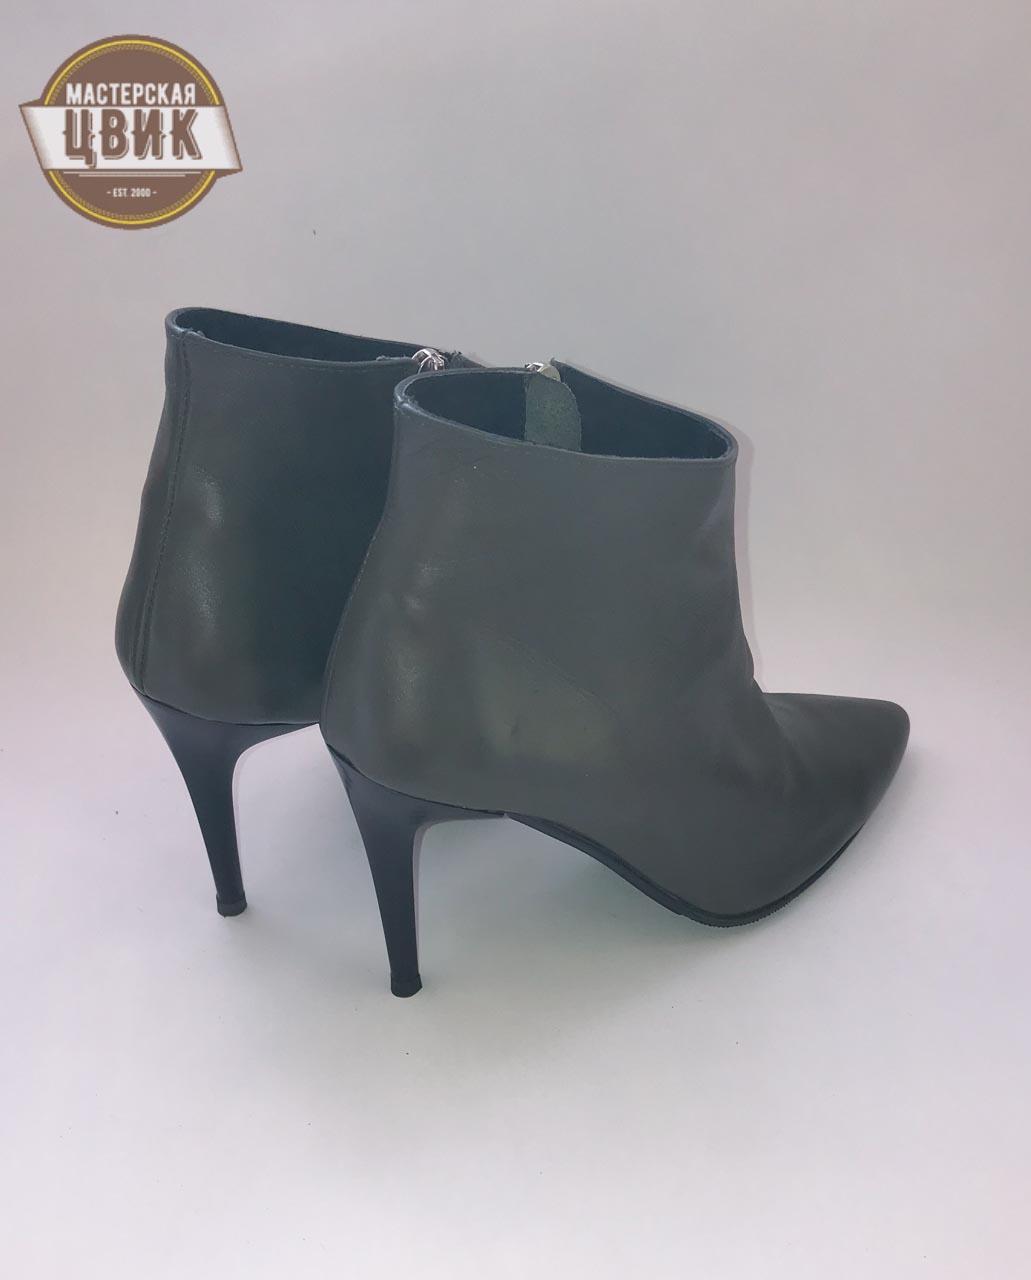 individualnyj-poshiv-obuvi-minsk-43 Индивидуальный пошив обуви